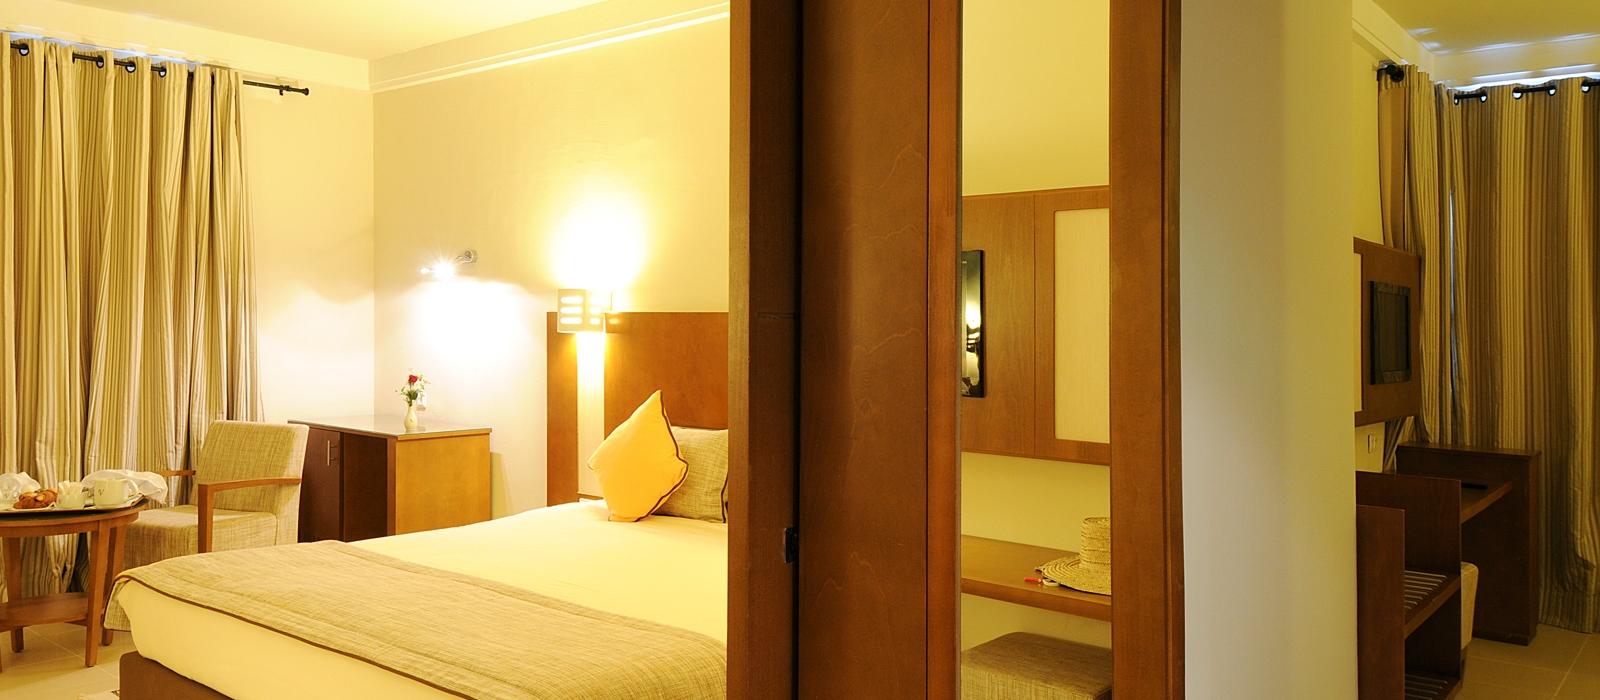 Chambres Hôtel Vincci Helios Beach Djerba - Chambre triple